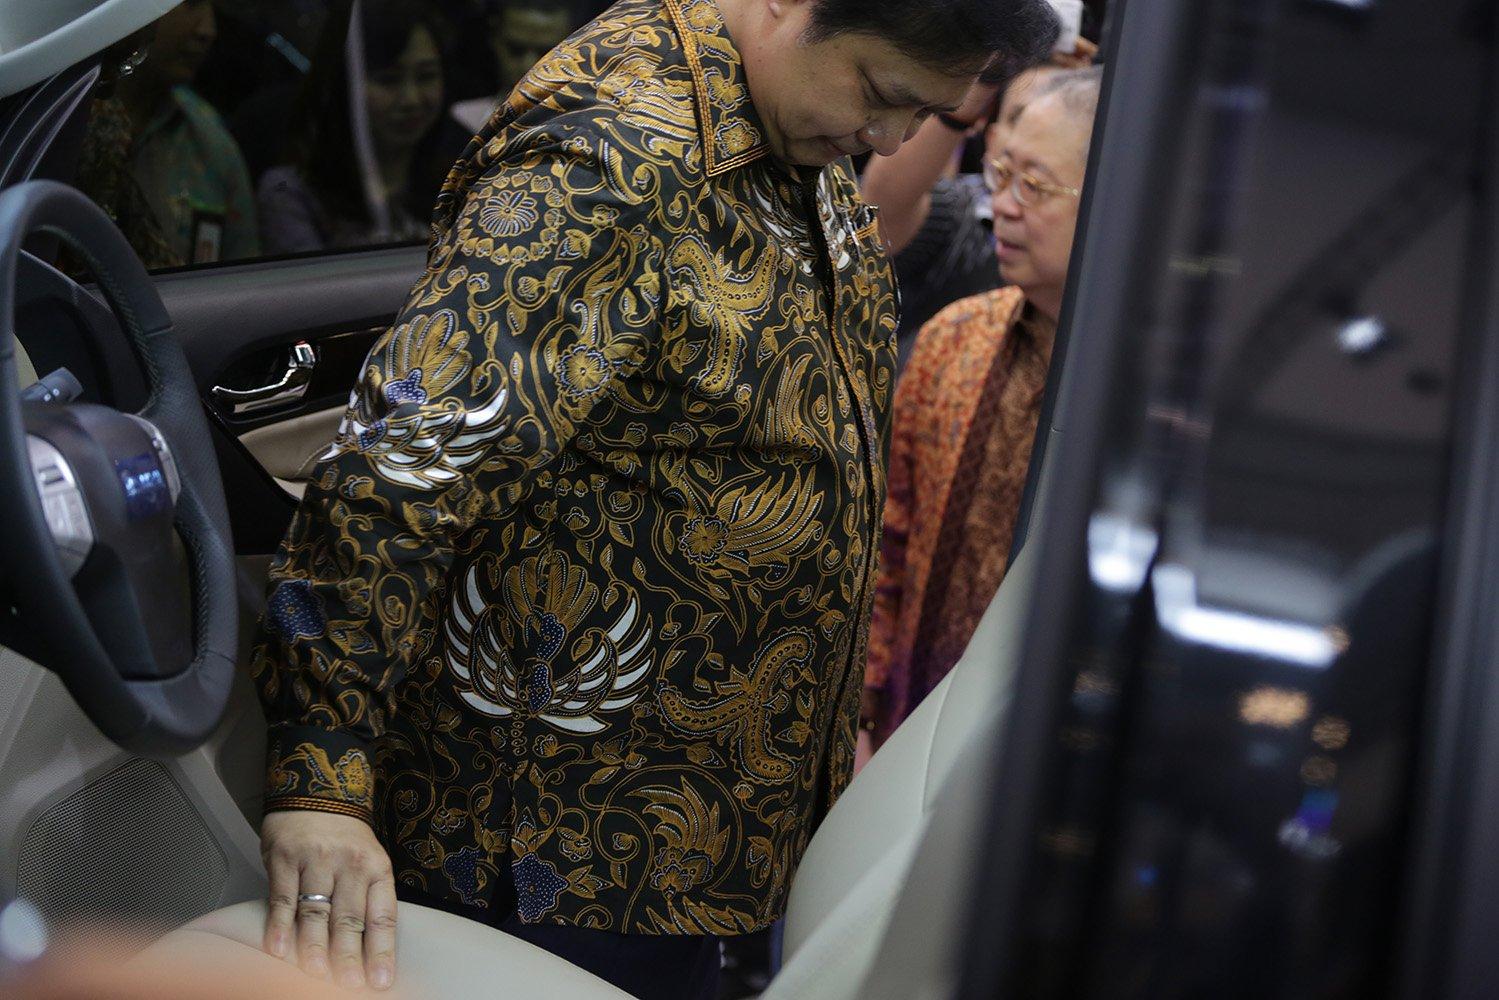 Menteri Perindustrian Airlangga Hartarto meninjau stand pamer mobil pada acara GIIAS 2017 di Tangerang, Banten, Kamis (10/8)